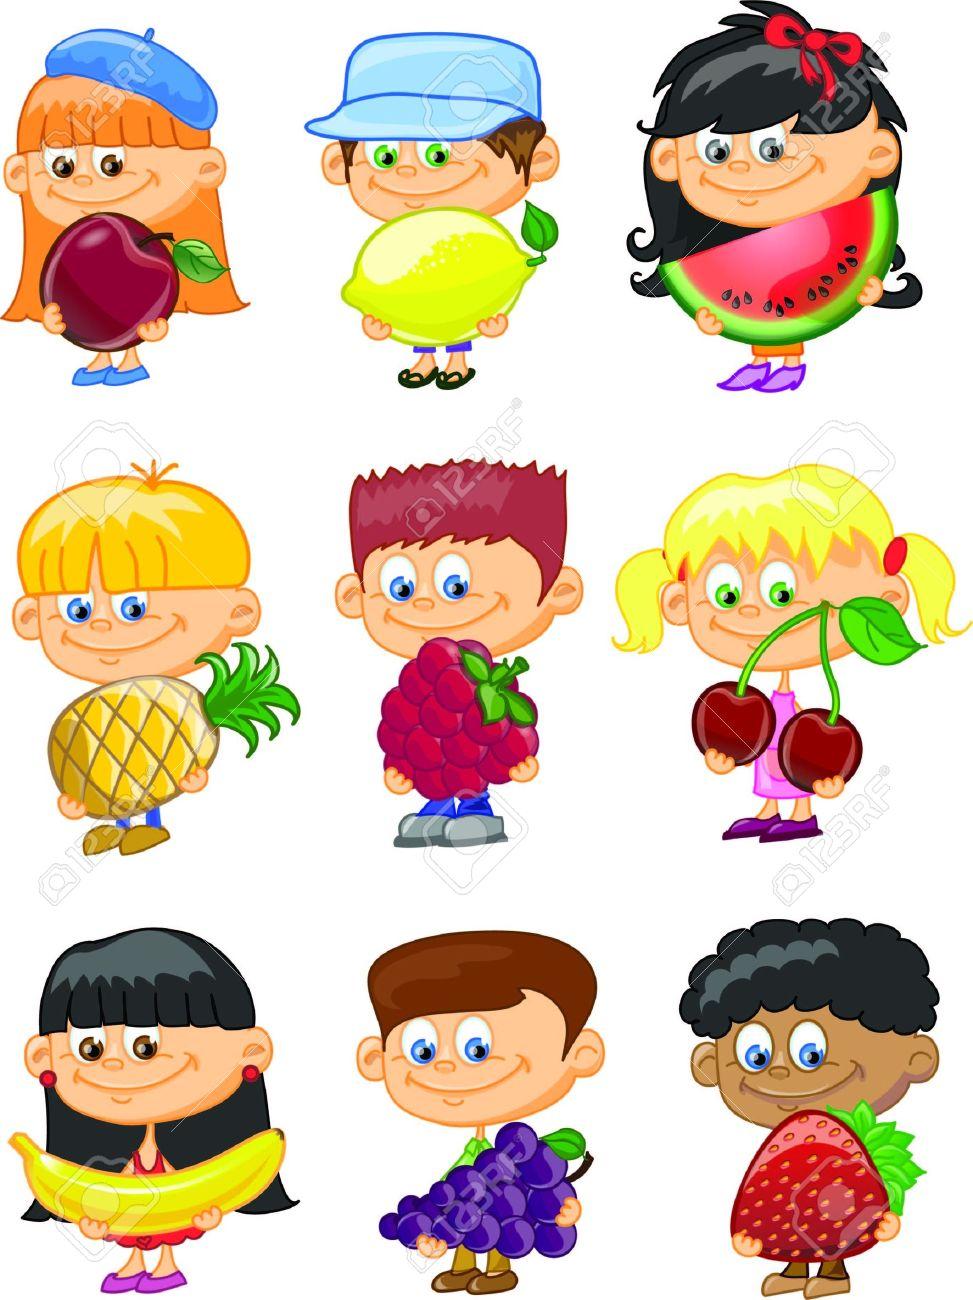 cartoon children with fruits stock vector 18101876 - Free Children Cartoon